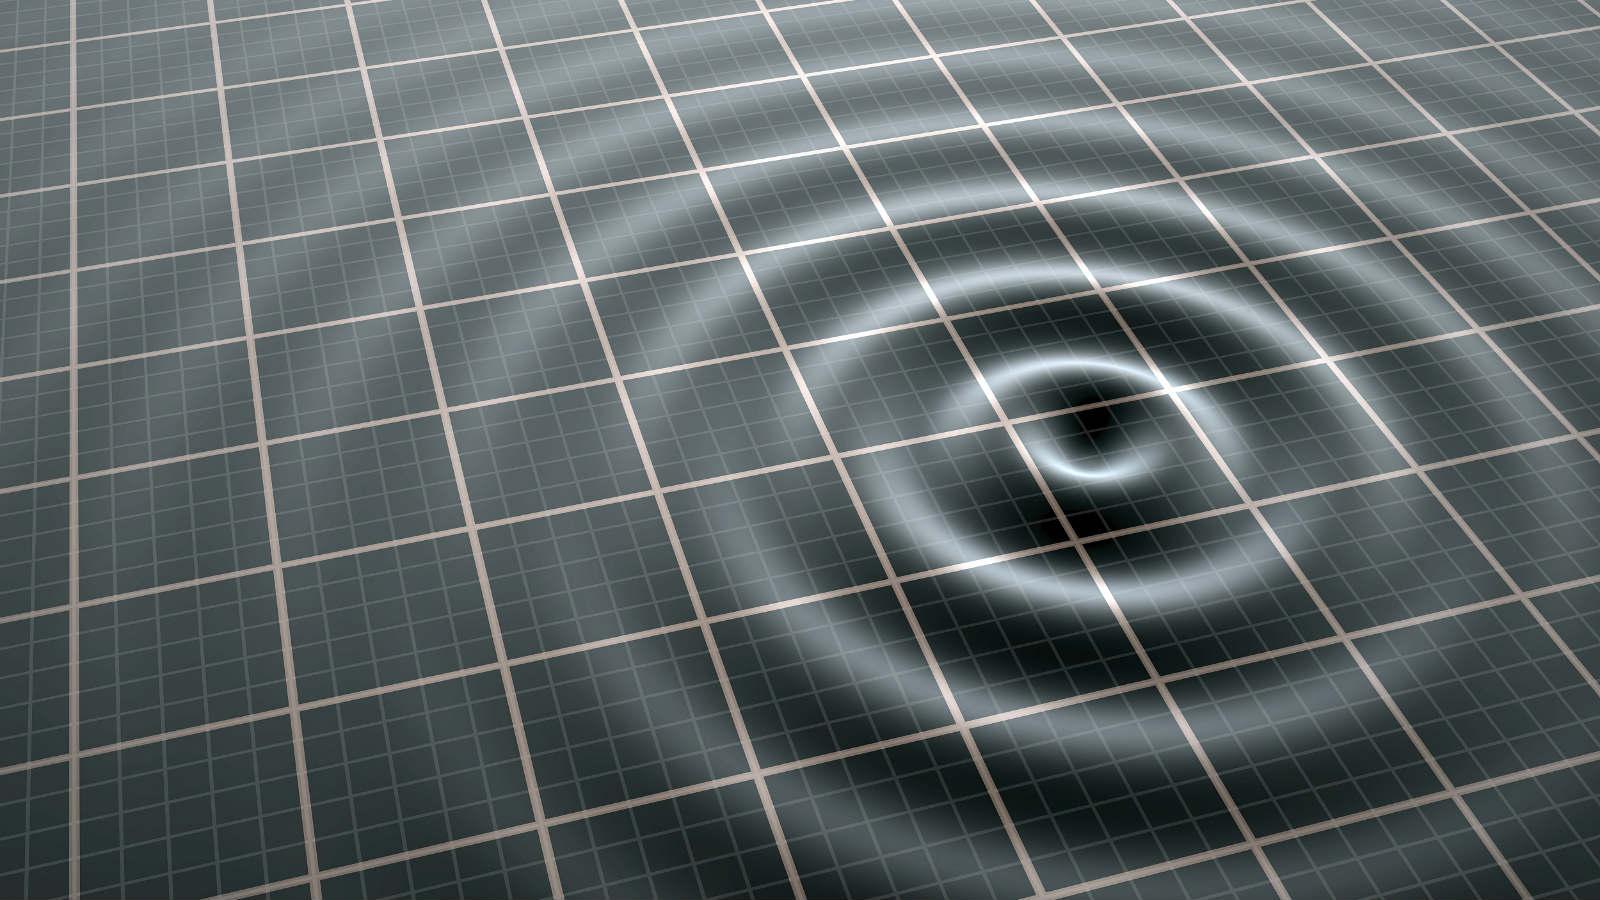 5.5-magnitude quake hits North of Ascension Island -- USGS